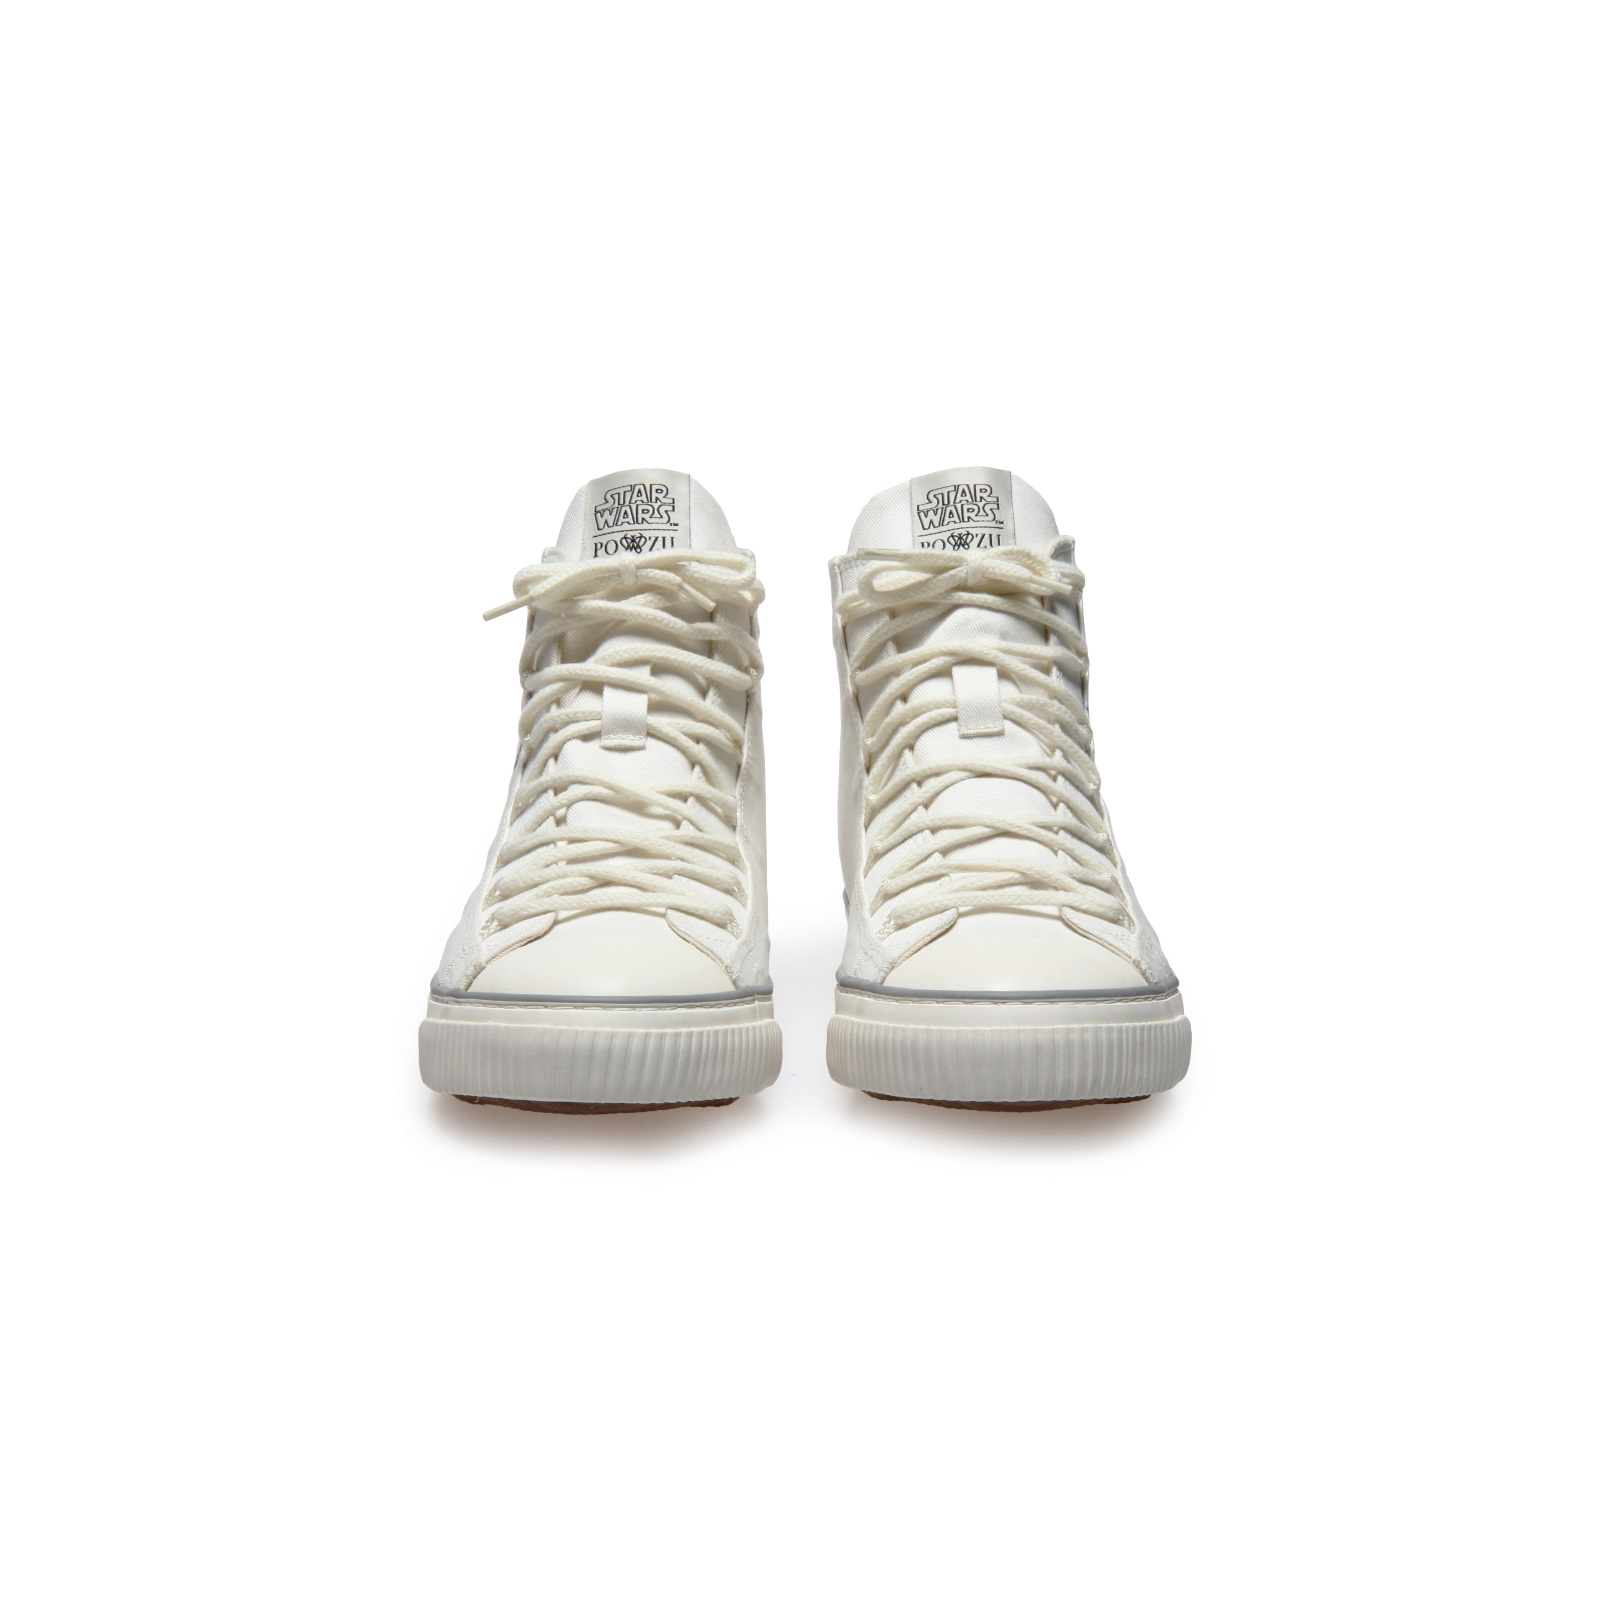 Po-Zu x Star Wars Rey High-Top Sneakers